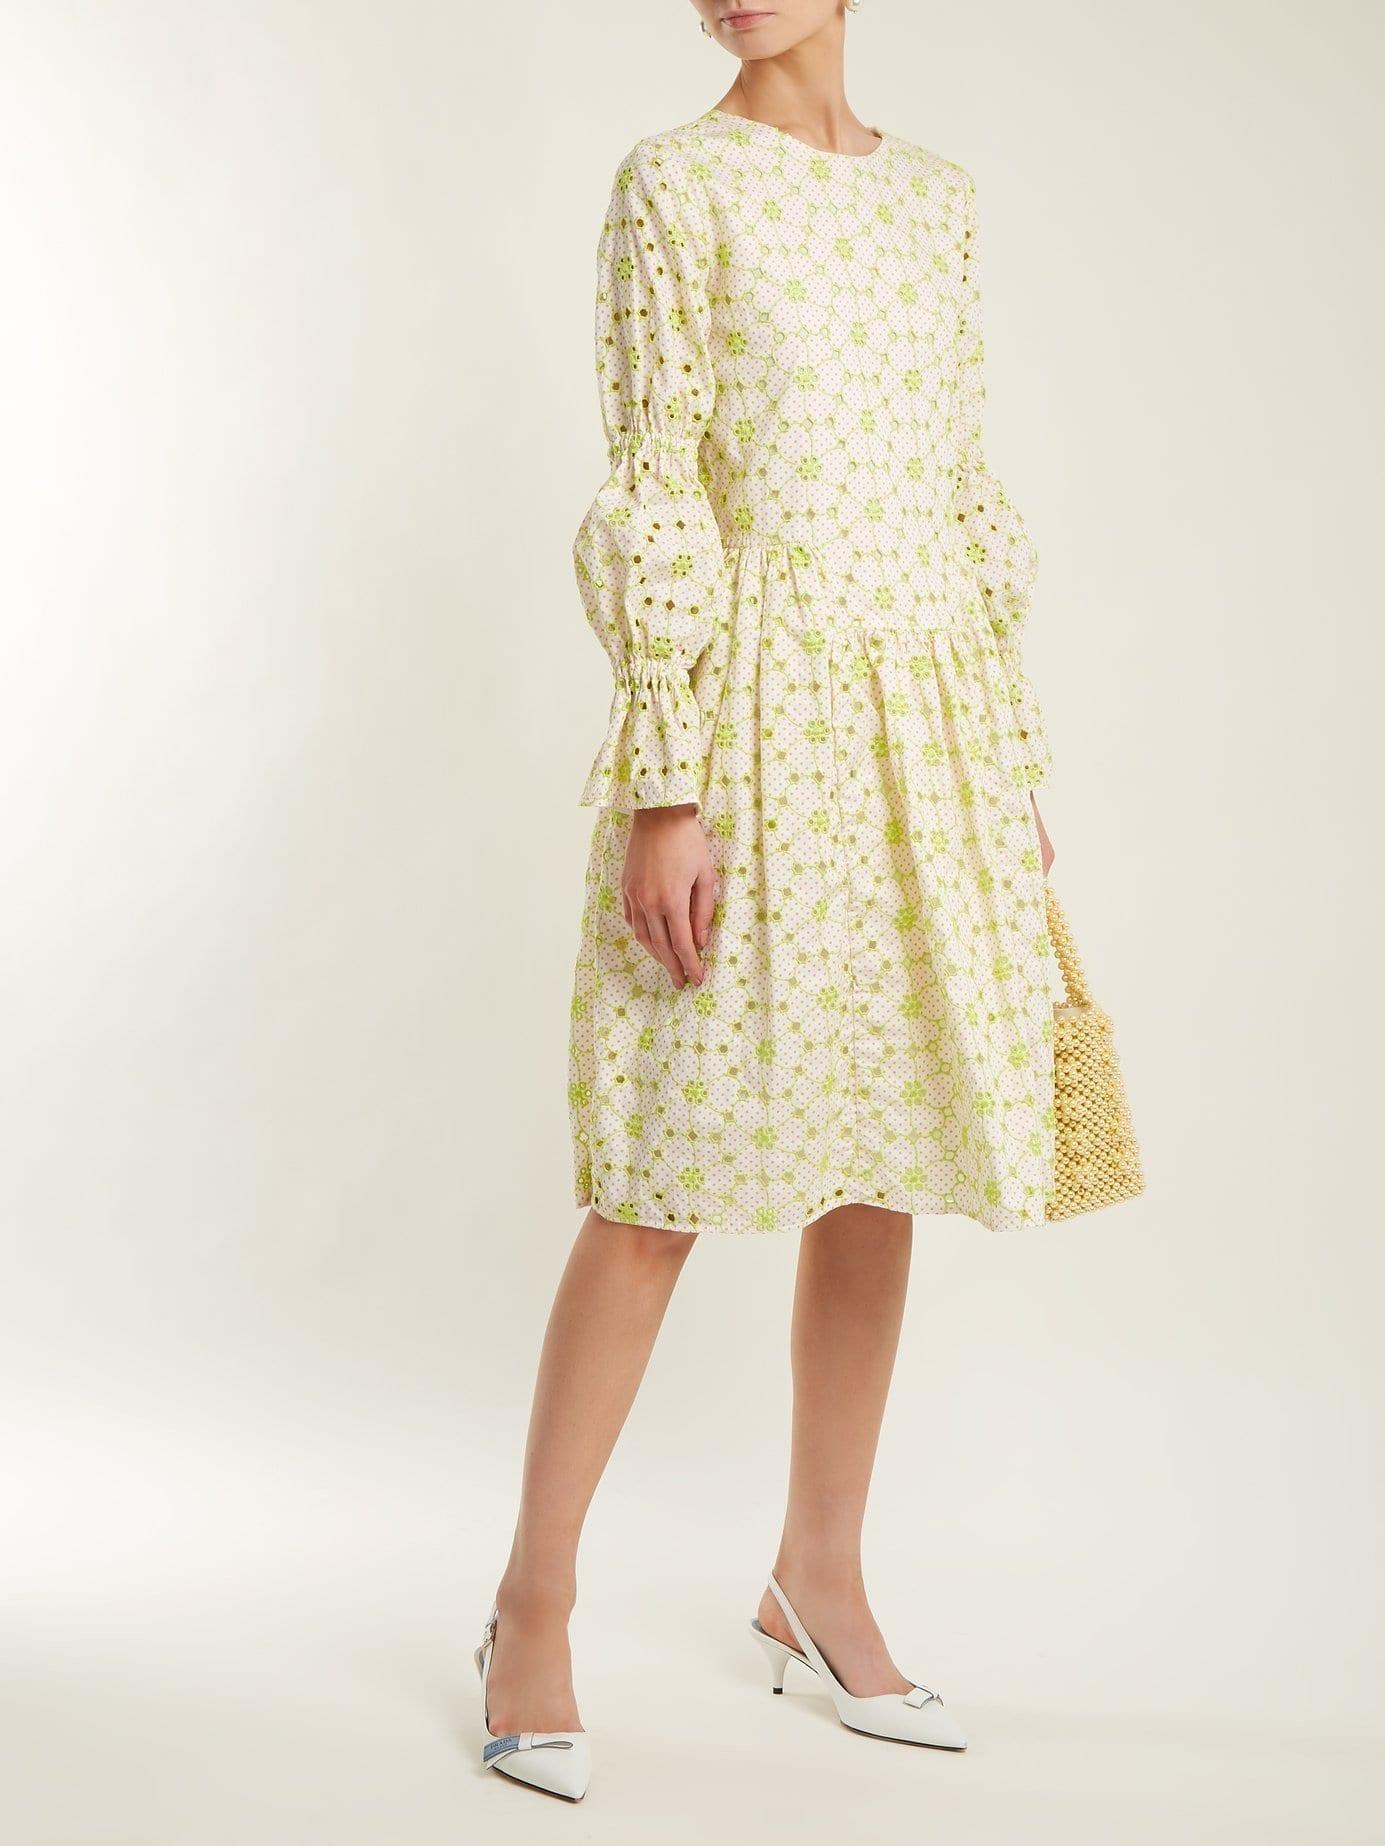 SHRIMPS Peggy Floral Embroidered Cotton Blend Lime Green Dress